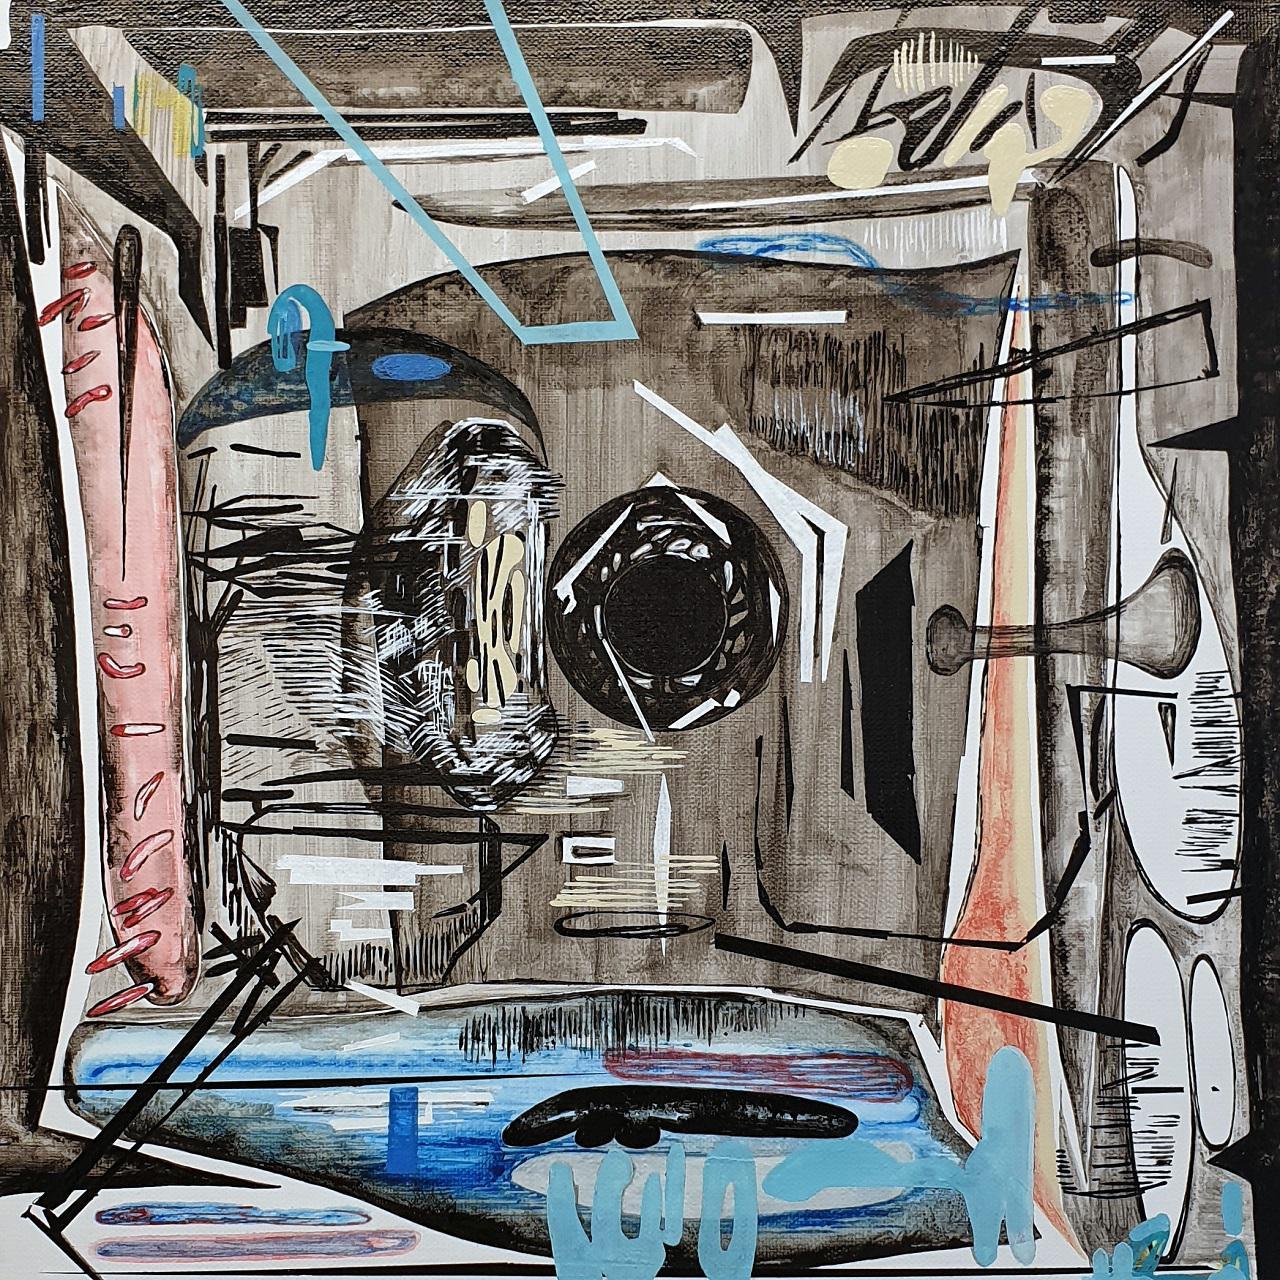 Vana Fertaki, Space, varnish and oil on canvas,  40 x 40 cm, 2018